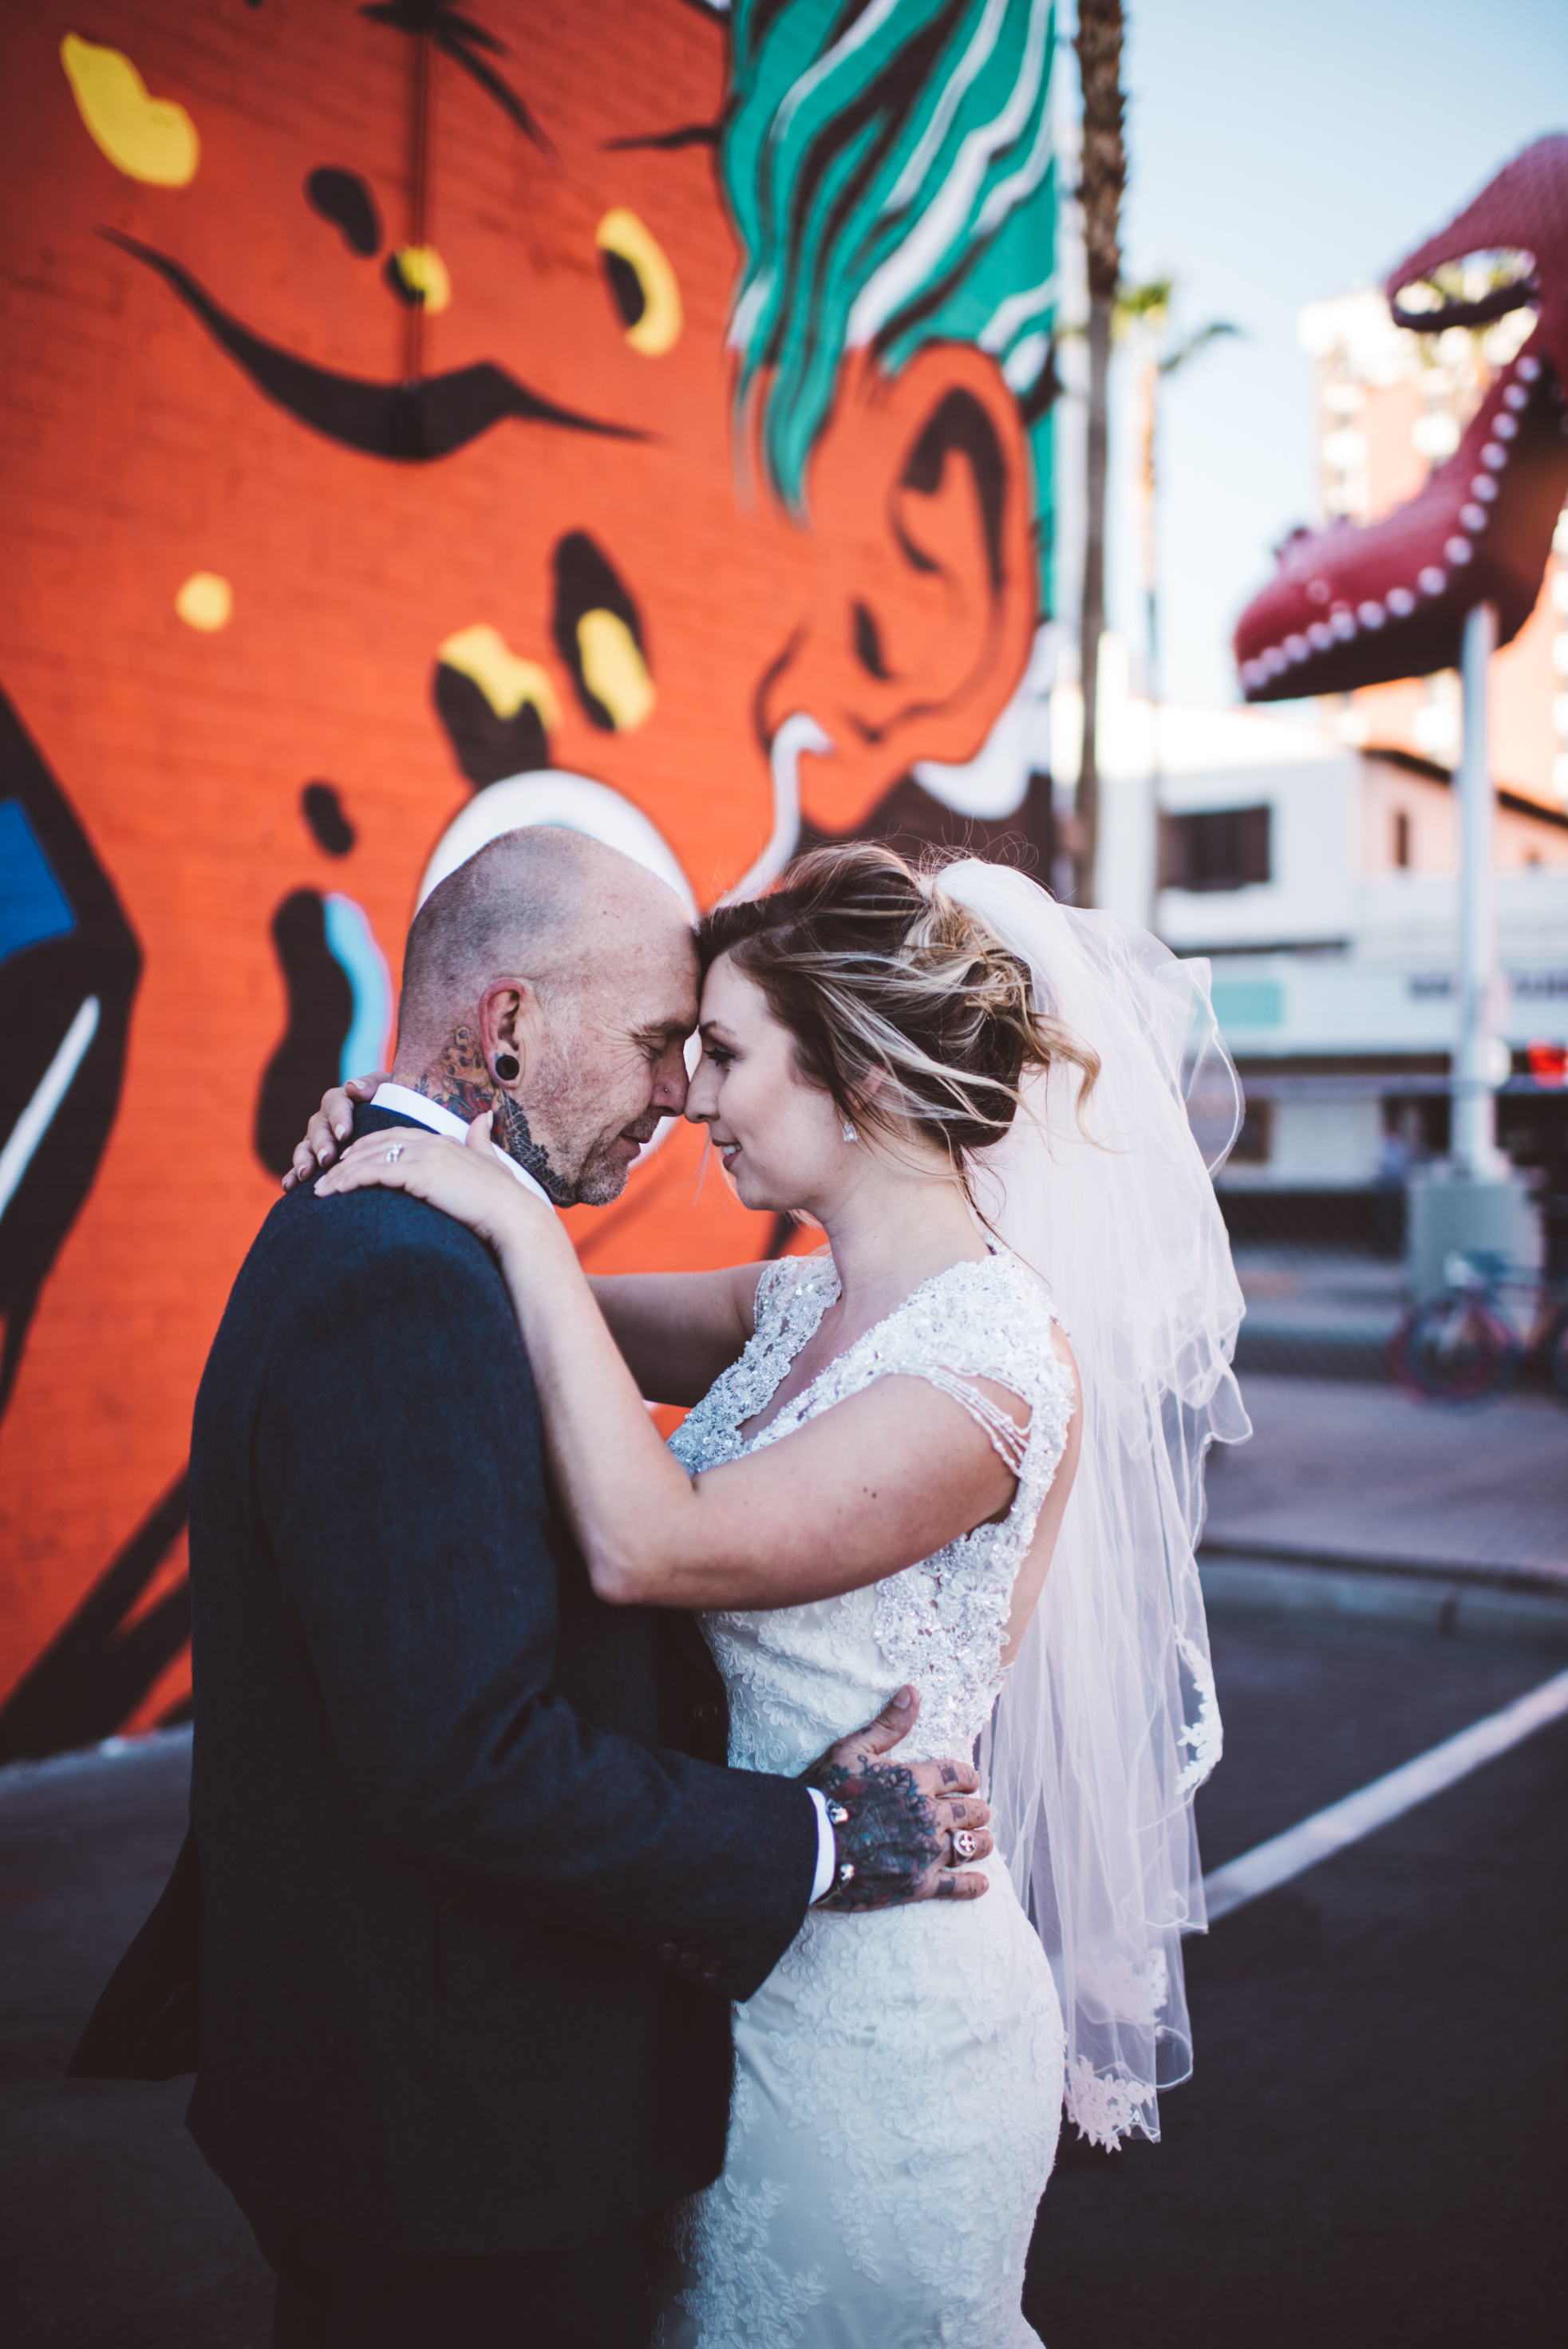 Las Vegas Elopement Photographer Ashley Marie Myers Rock'n Roll Bride-134.jpg